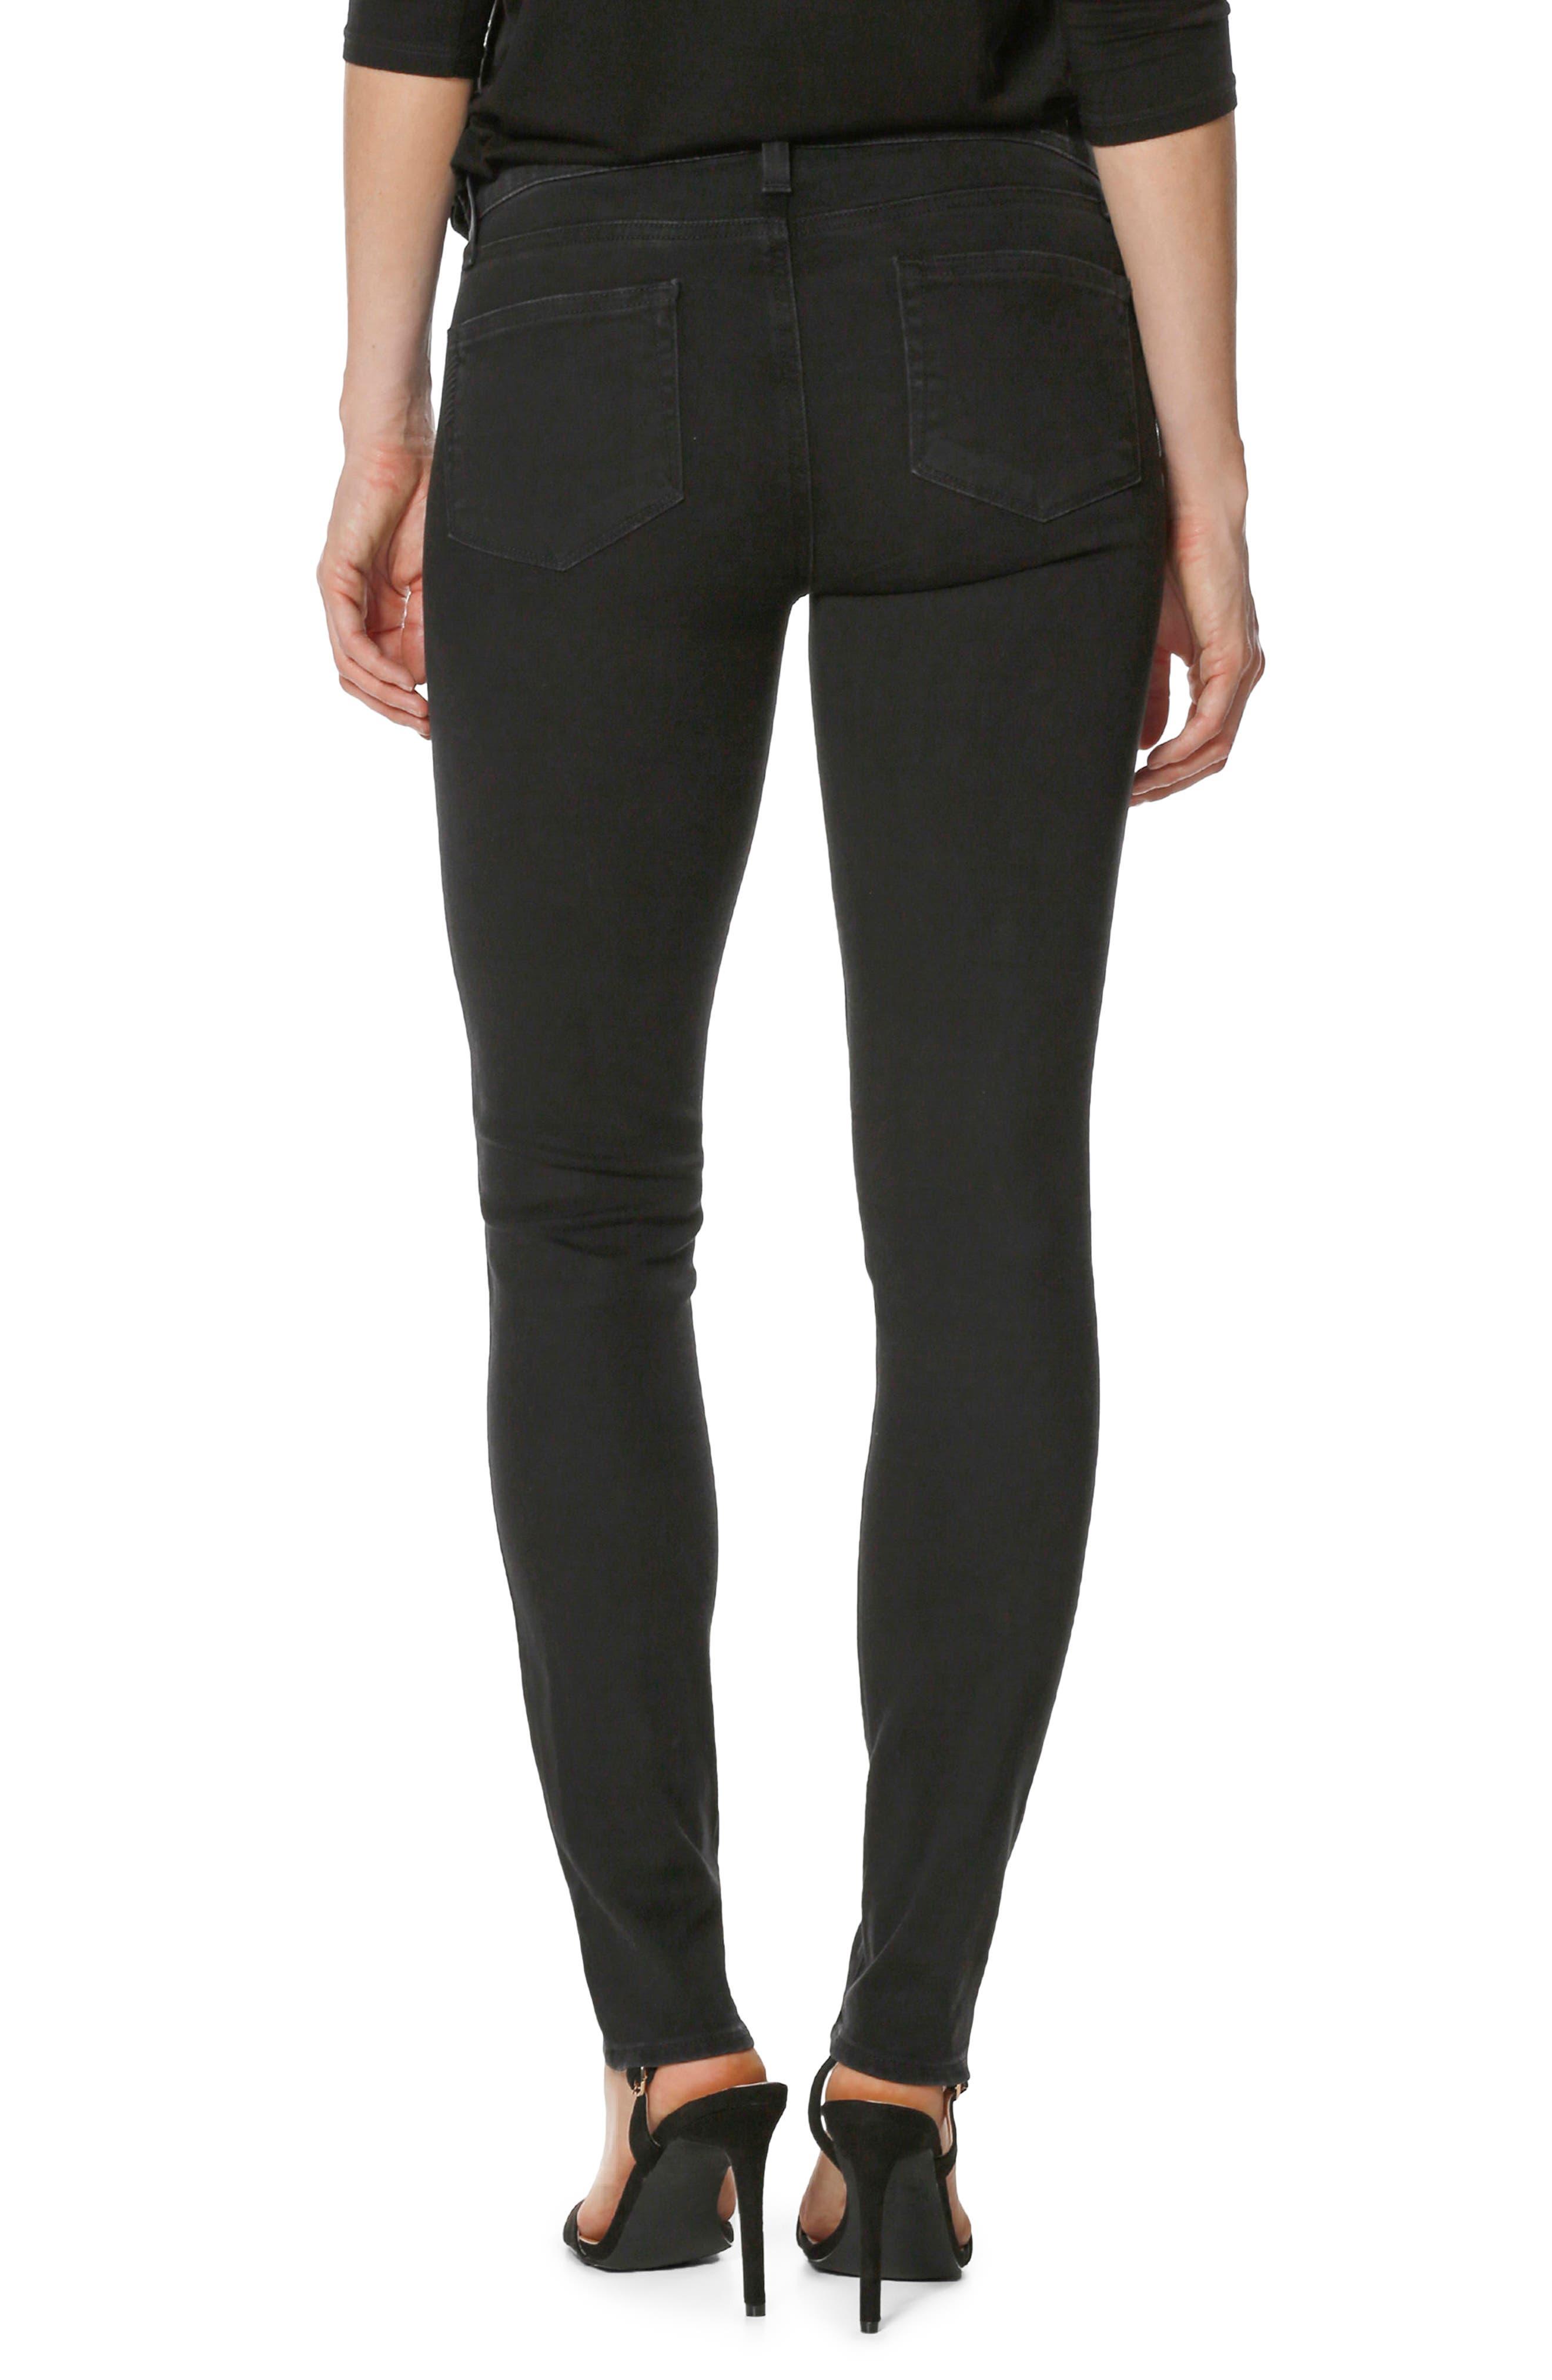 Verdugo Crystal Ultra Skinny Jeans,                             Alternate thumbnail 2, color,